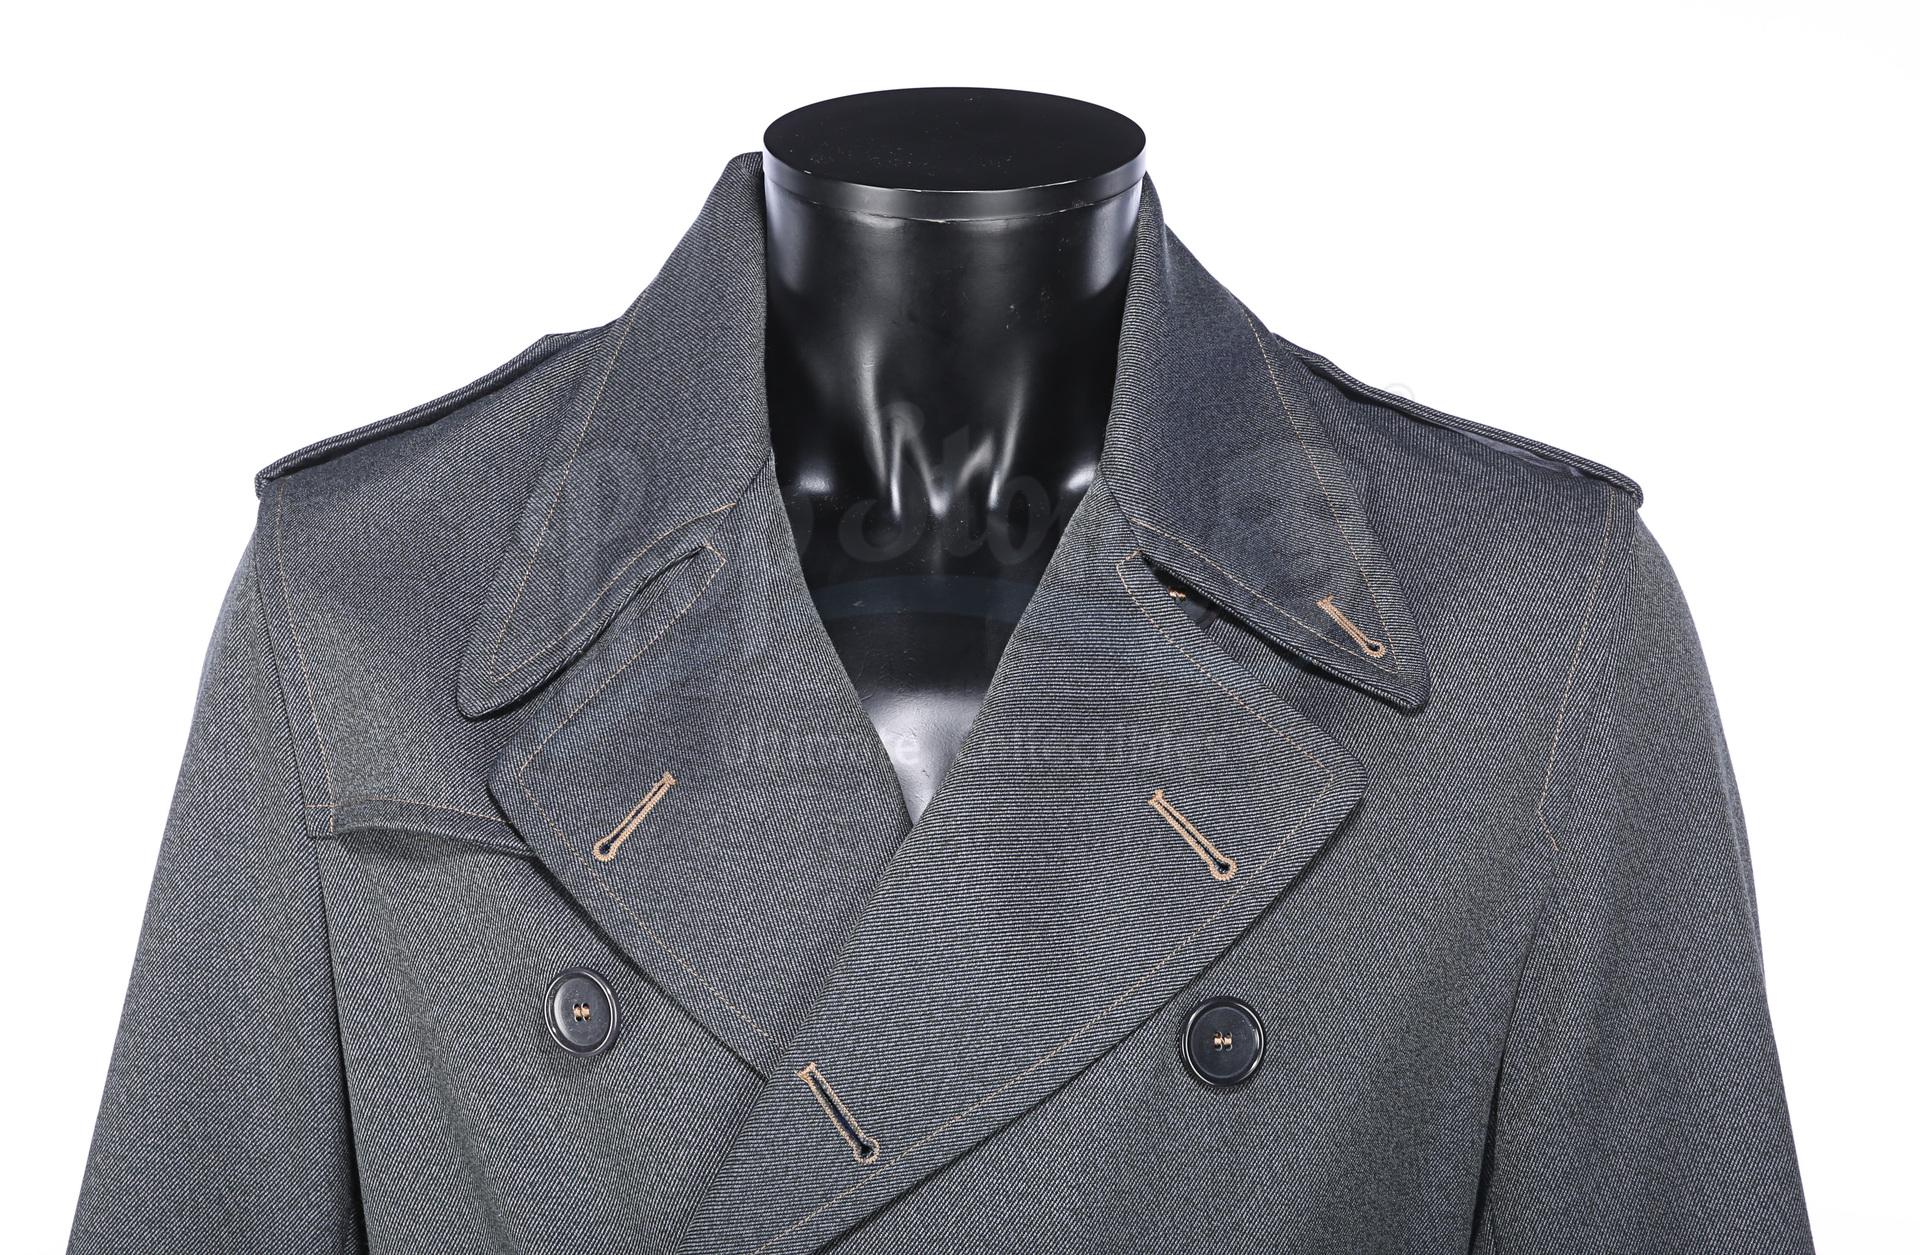 ALLIED (2016) - Max's (Brad Pitt) Military Overcoat - Image 4 of 17